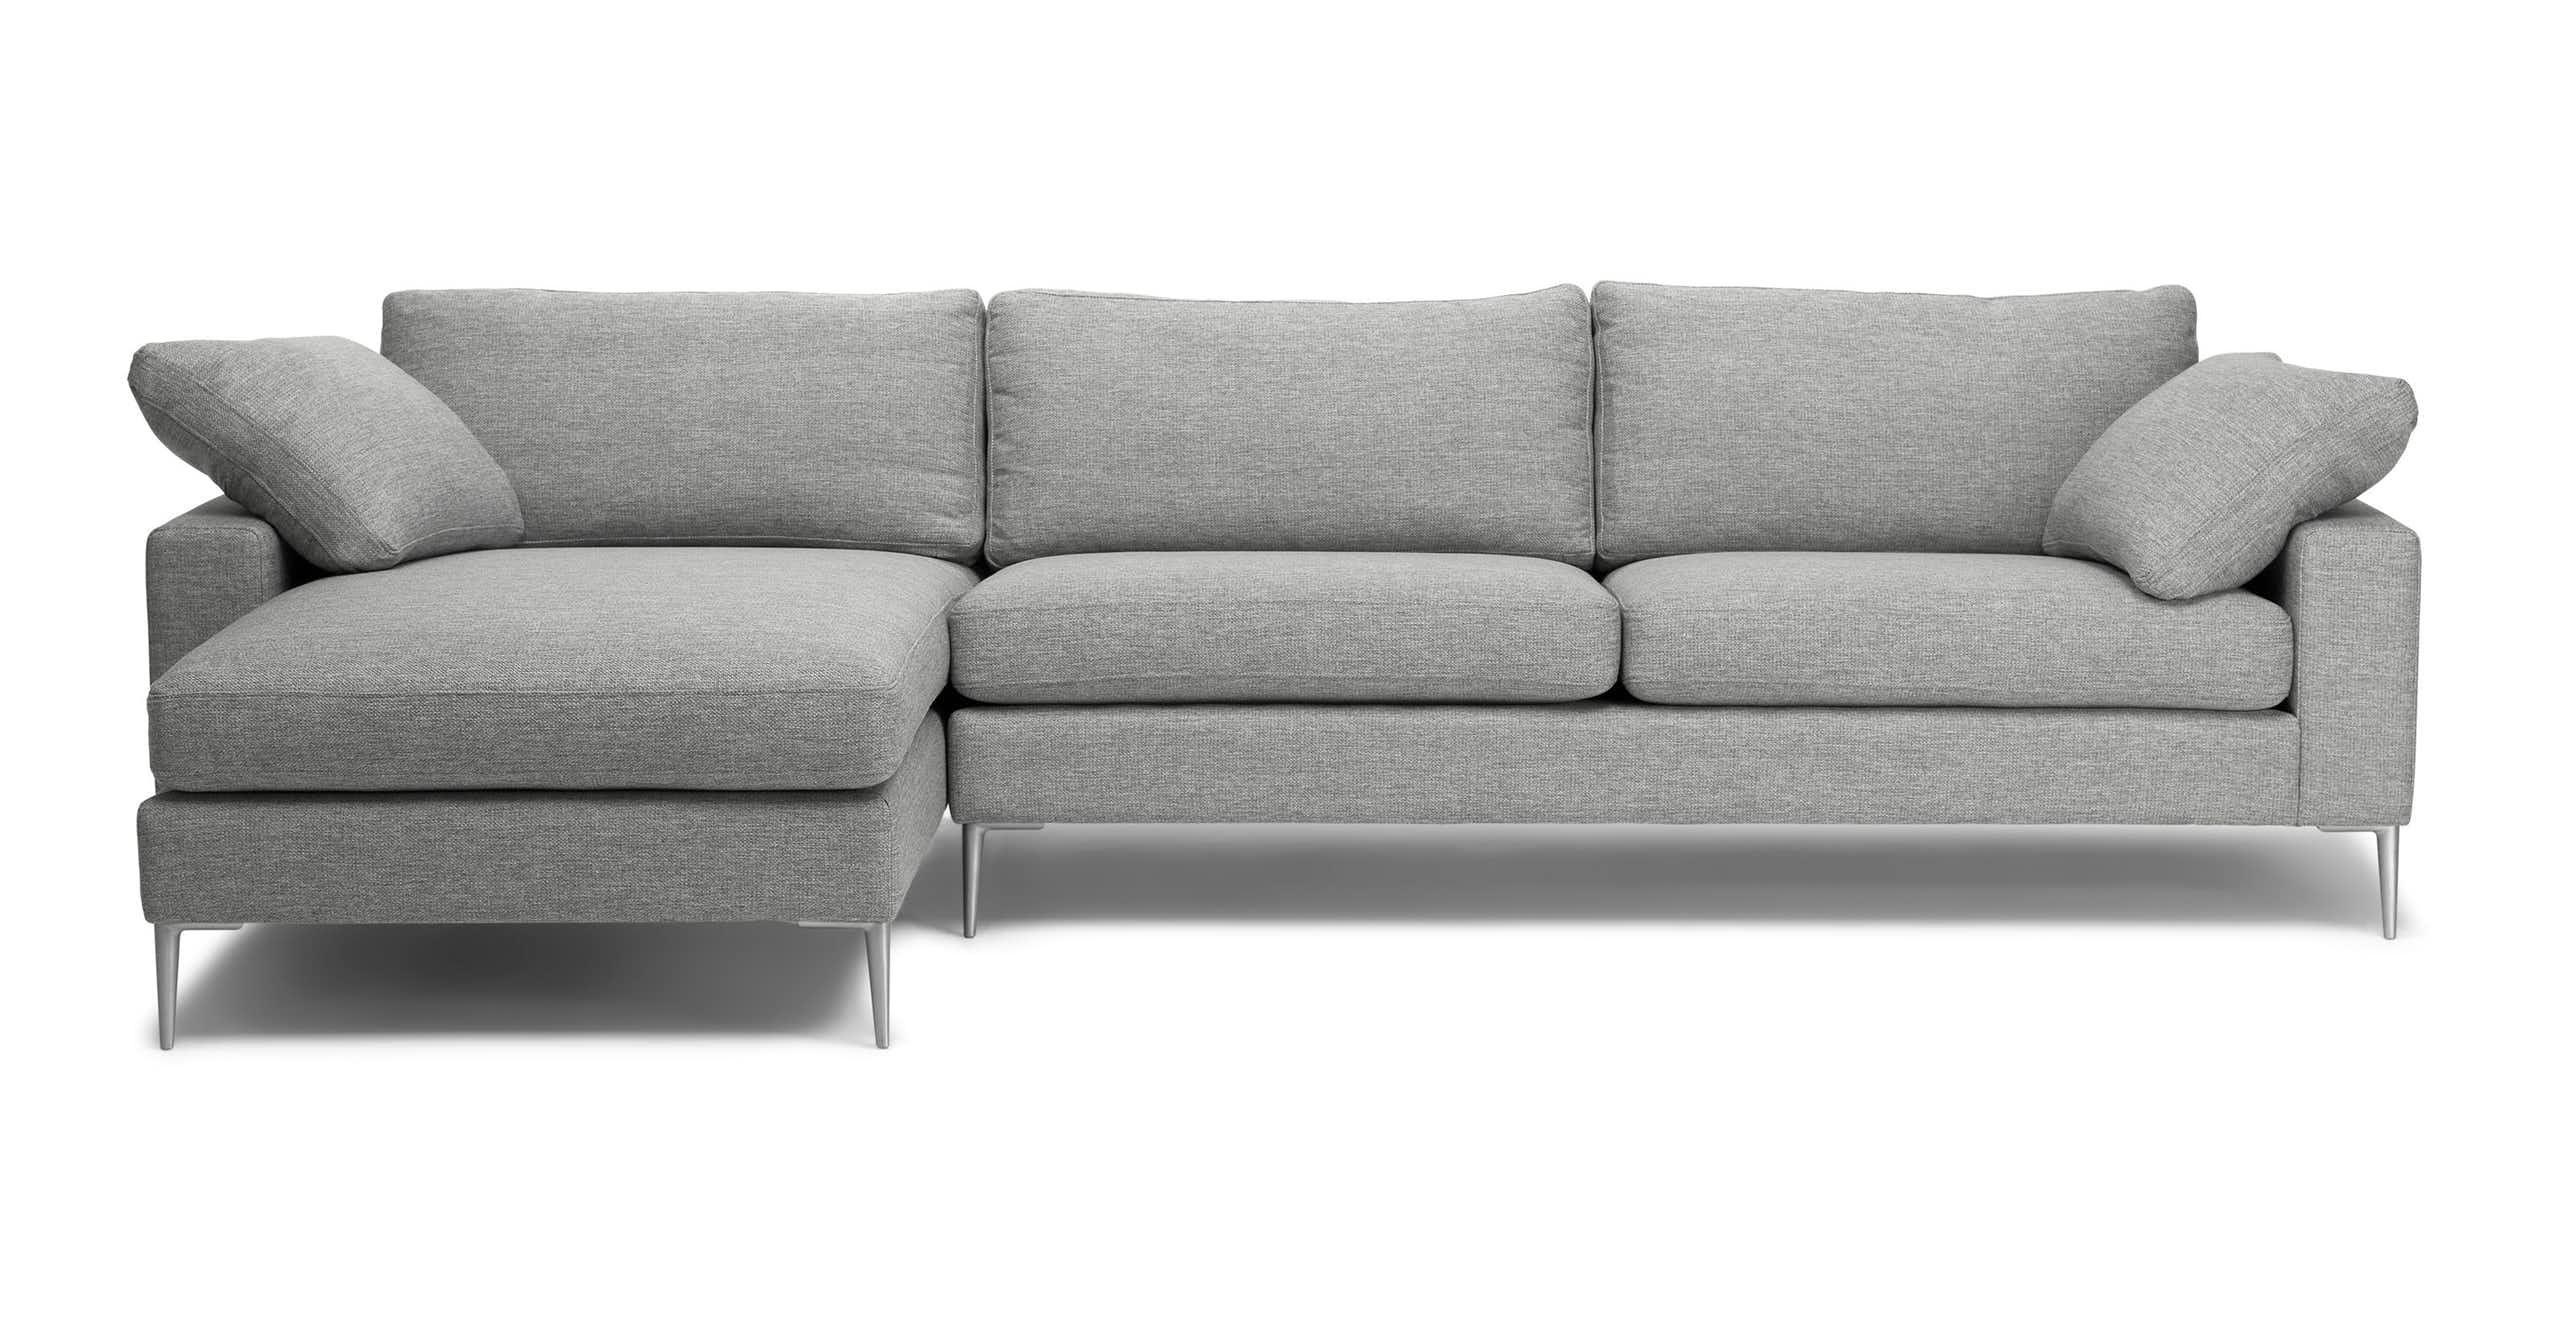 Nova Winter Gray Left Sectional Sofa   Mid Century Modern Intended For Florence Mid Century Modern Left Sectional Sofas (View 9 of 15)